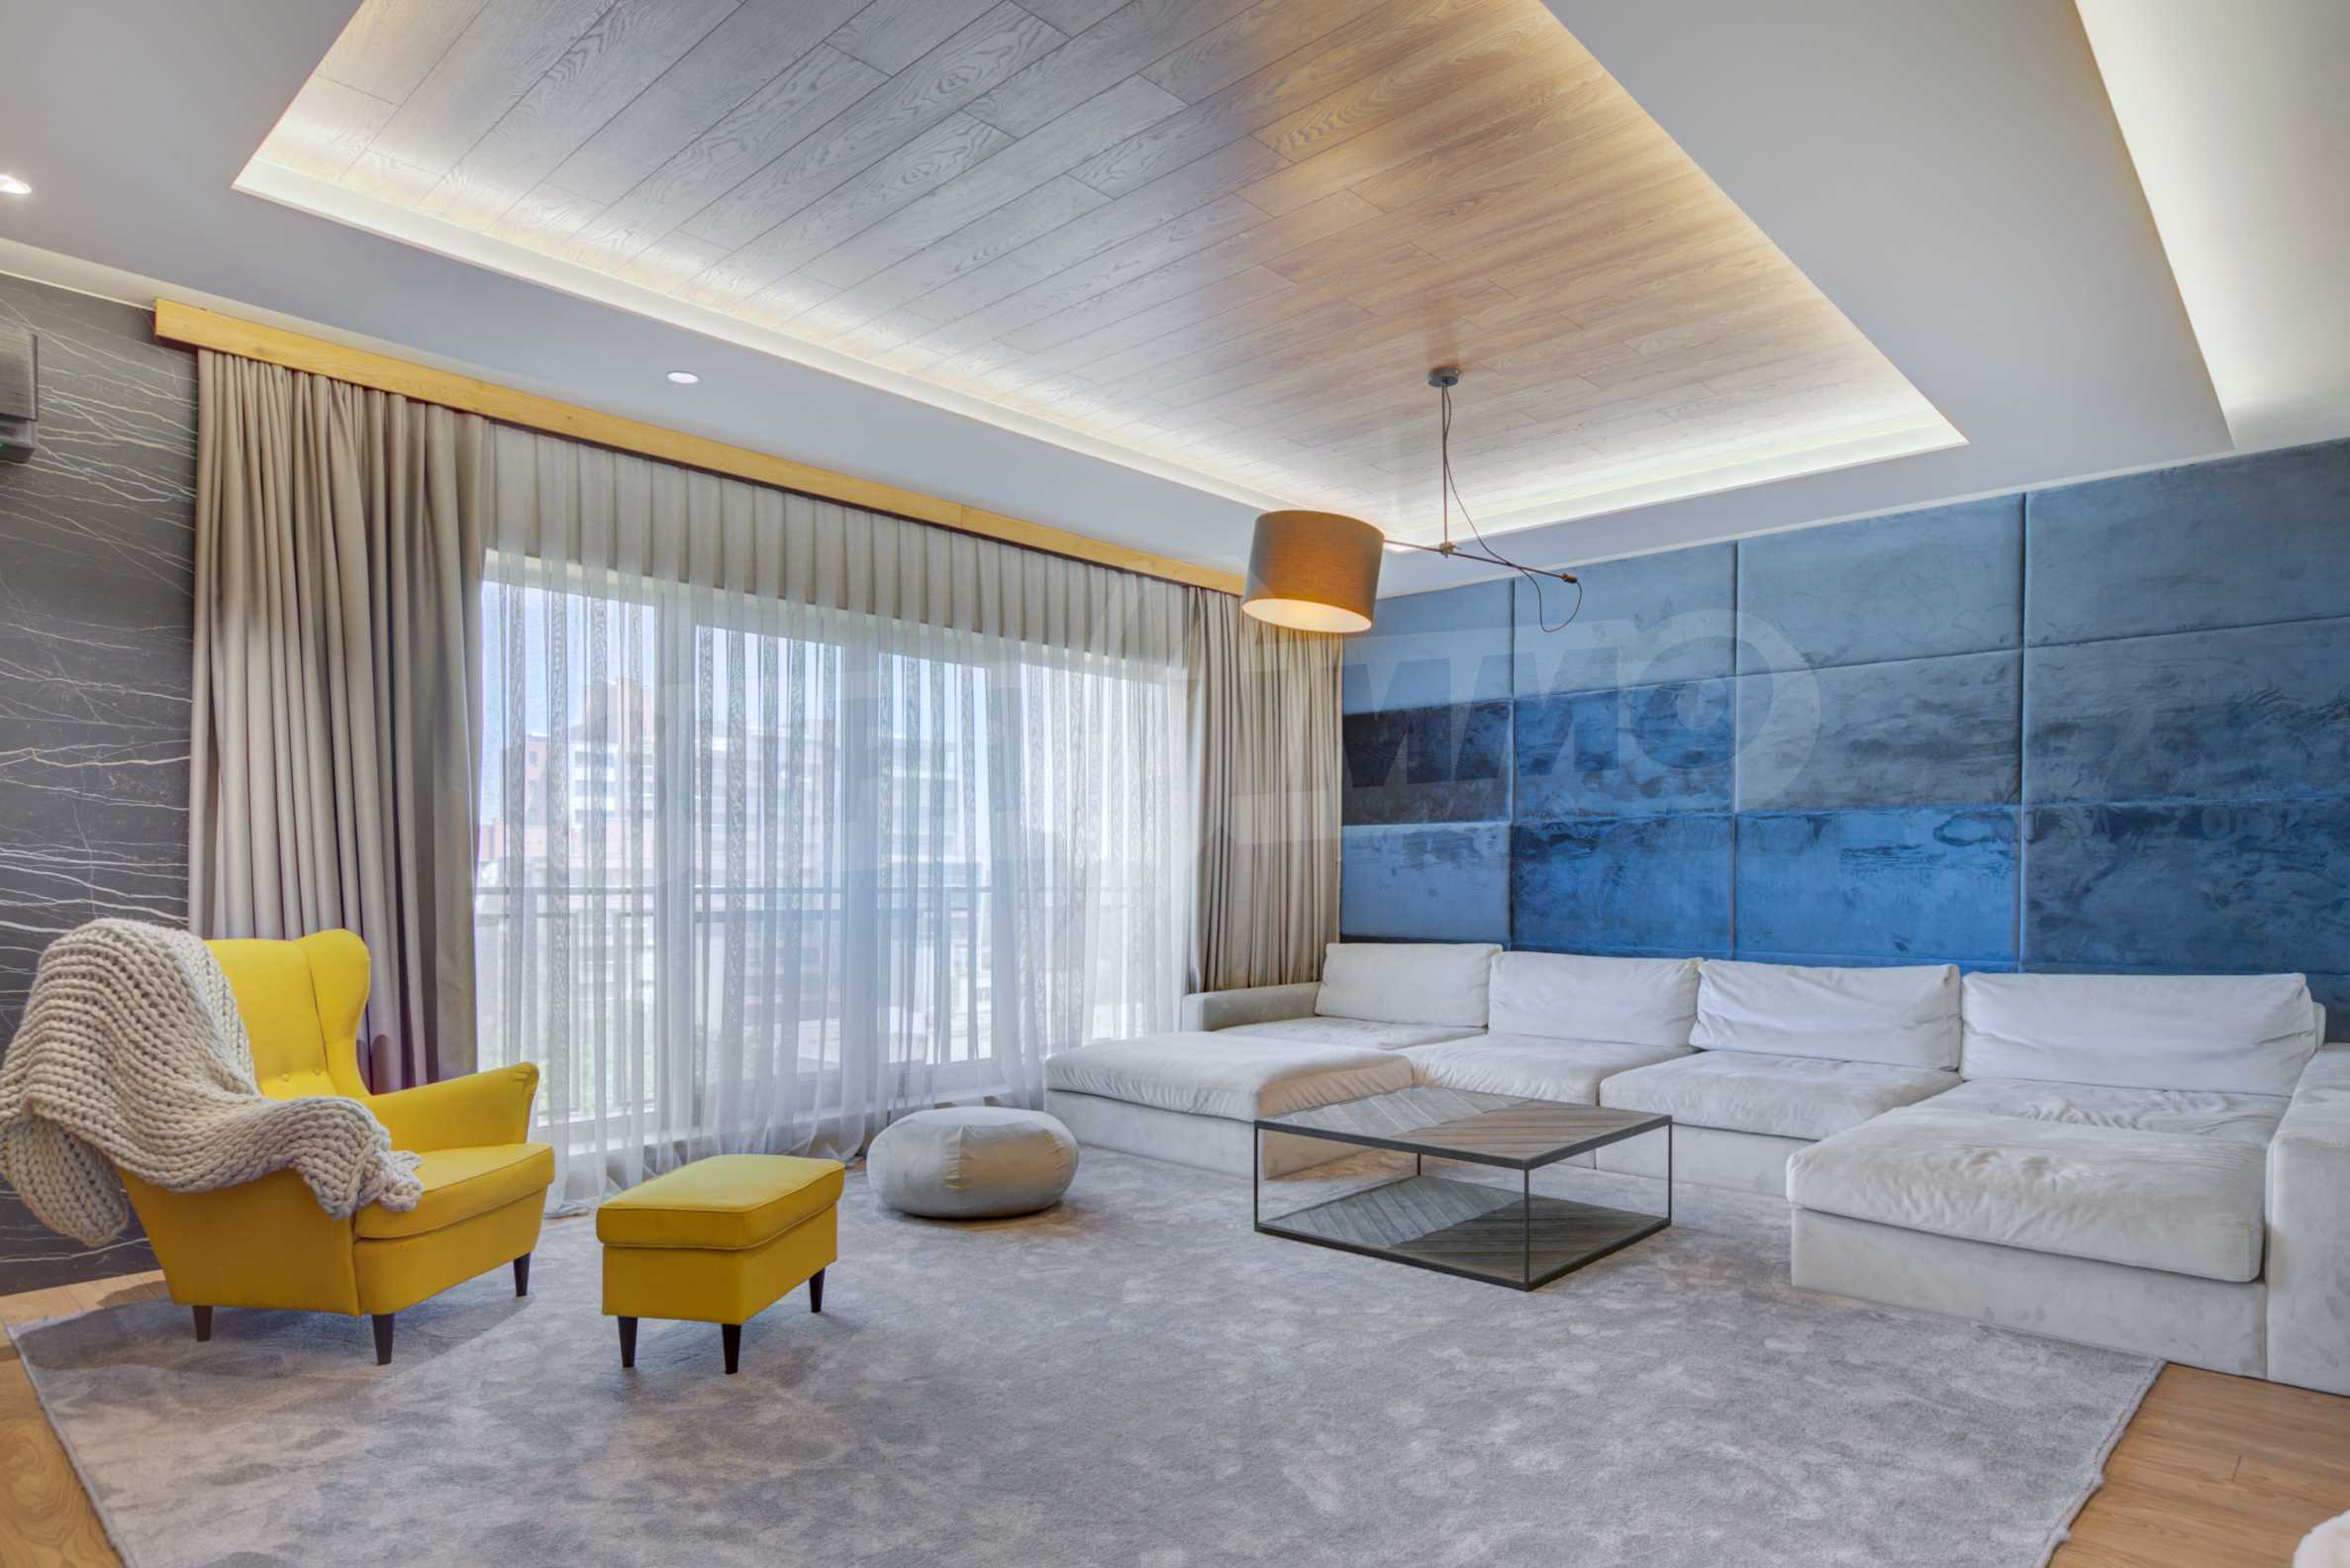 Дизайнерски обзаведен многостаен апартамент 1